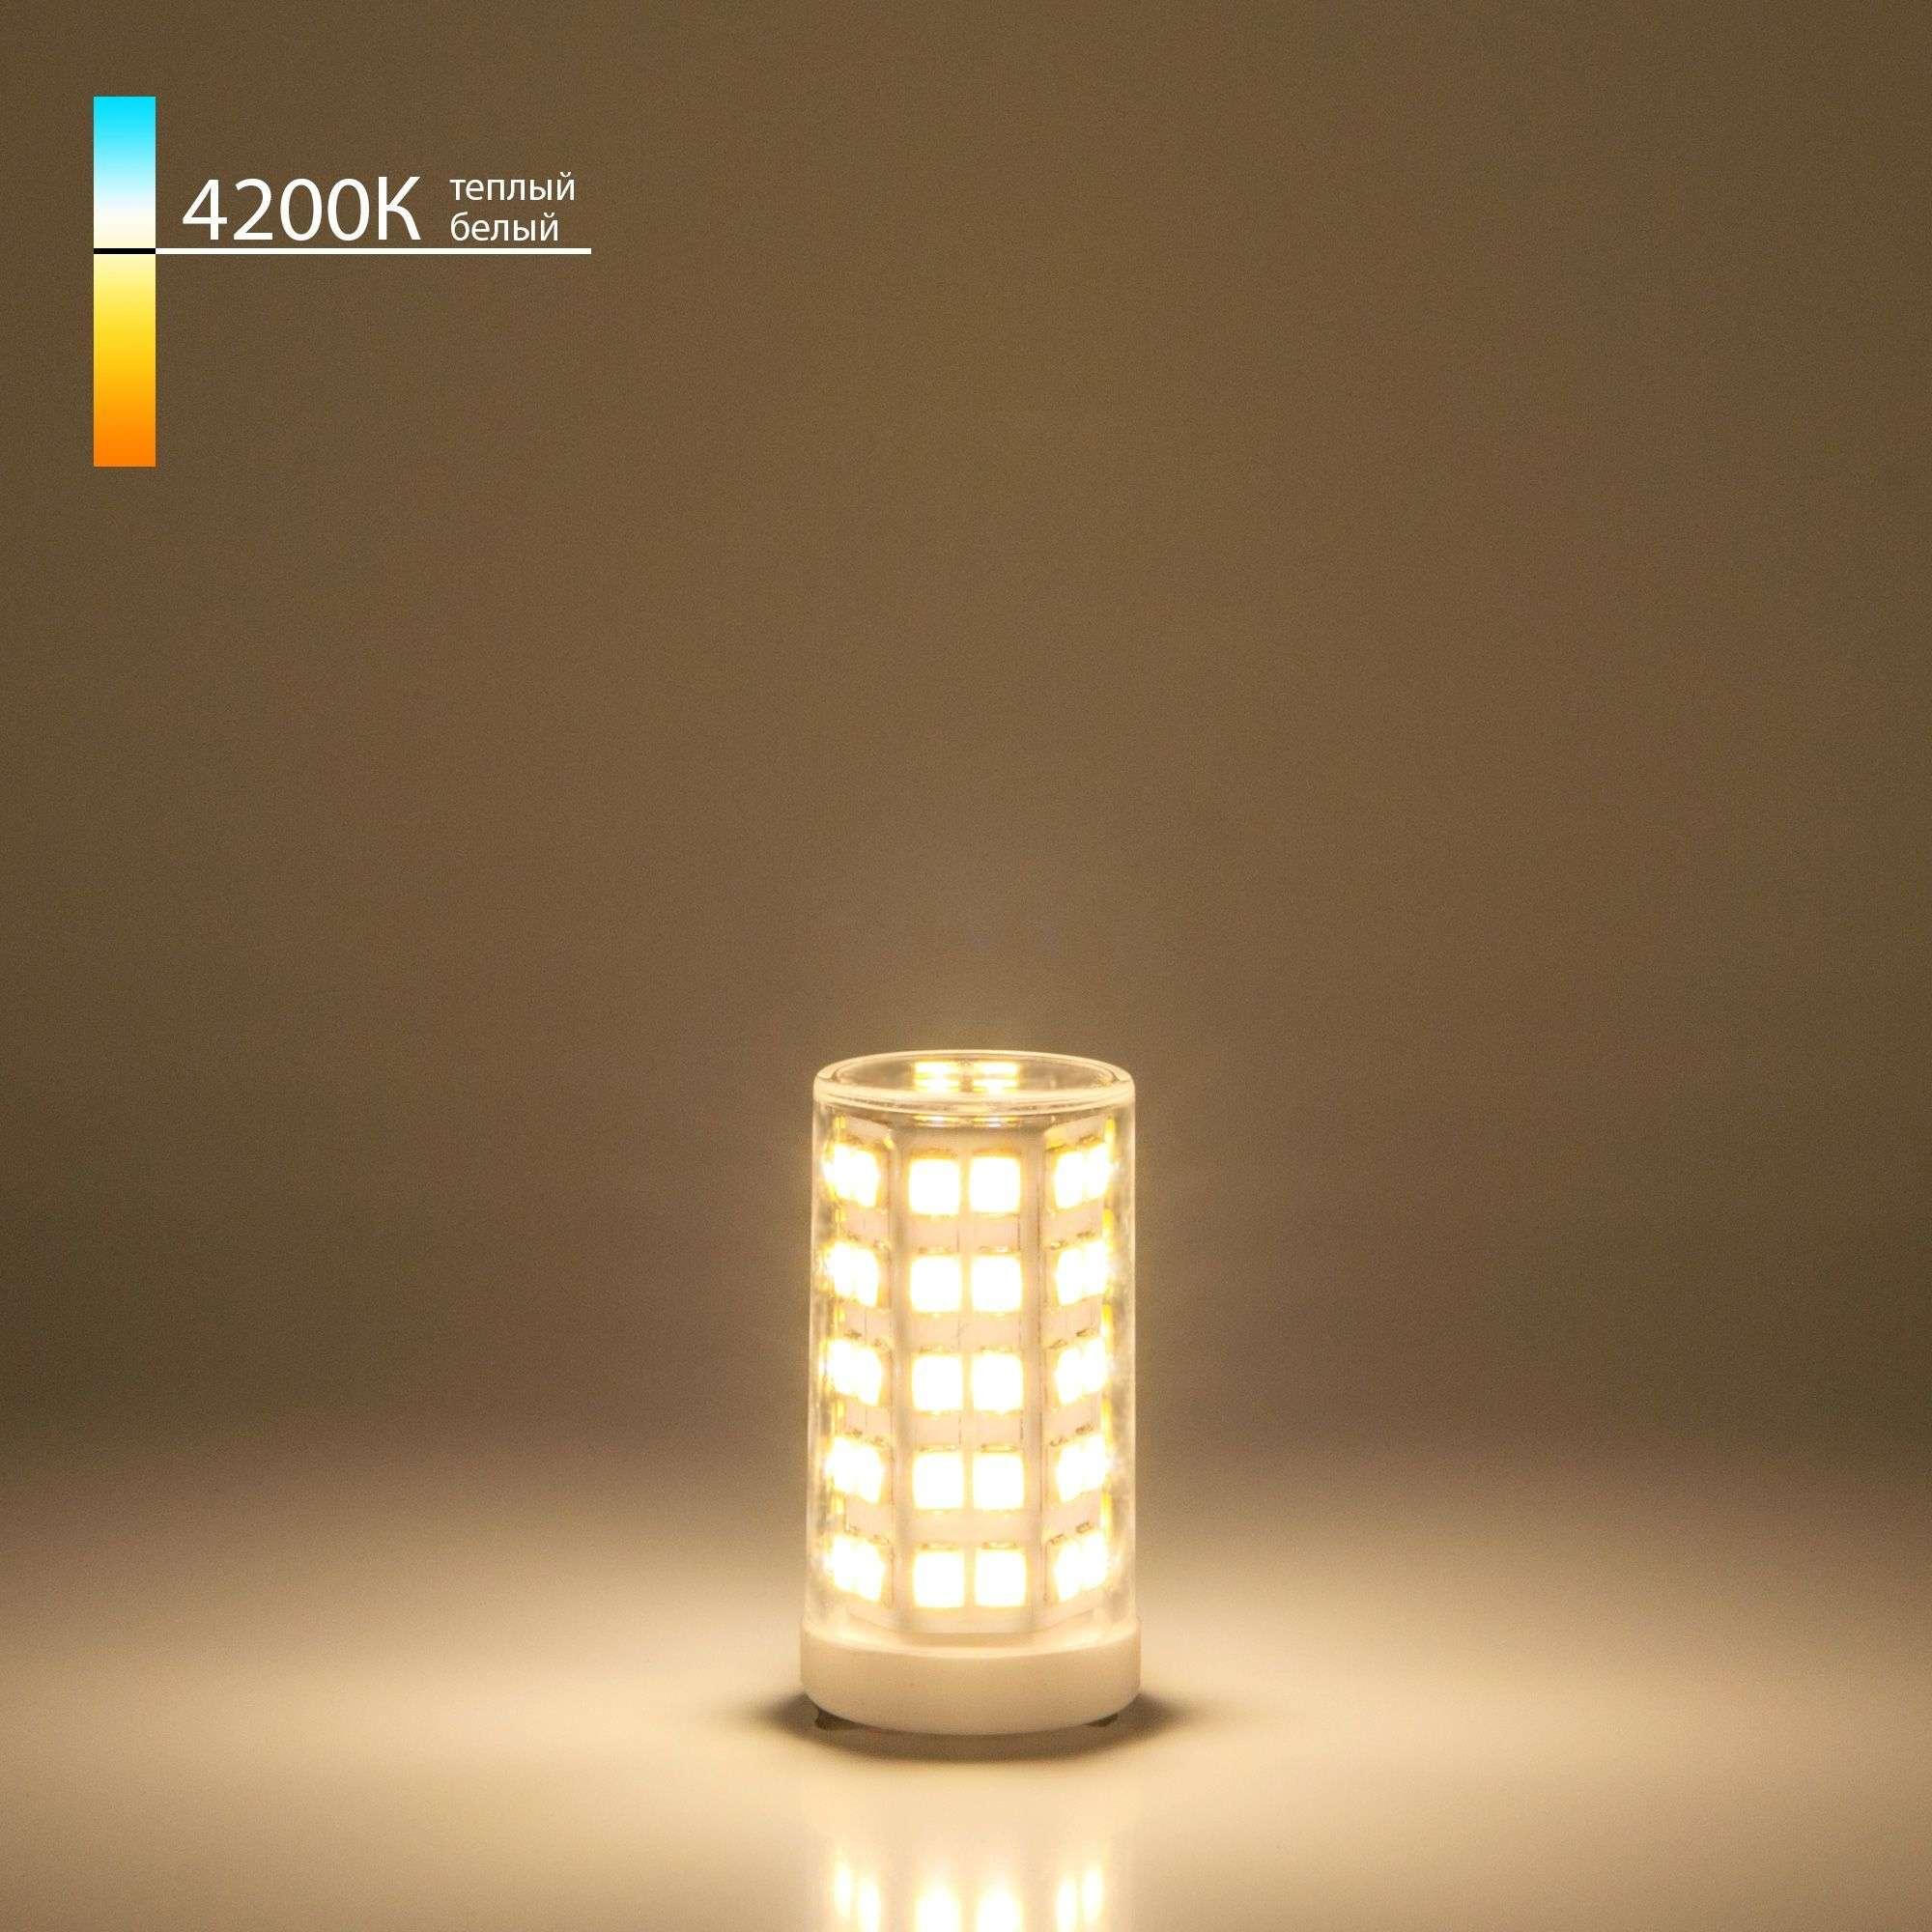 Cветодиодная лампа 9W 4200K G9 G9 LED BL110 9W 220V 4200 K